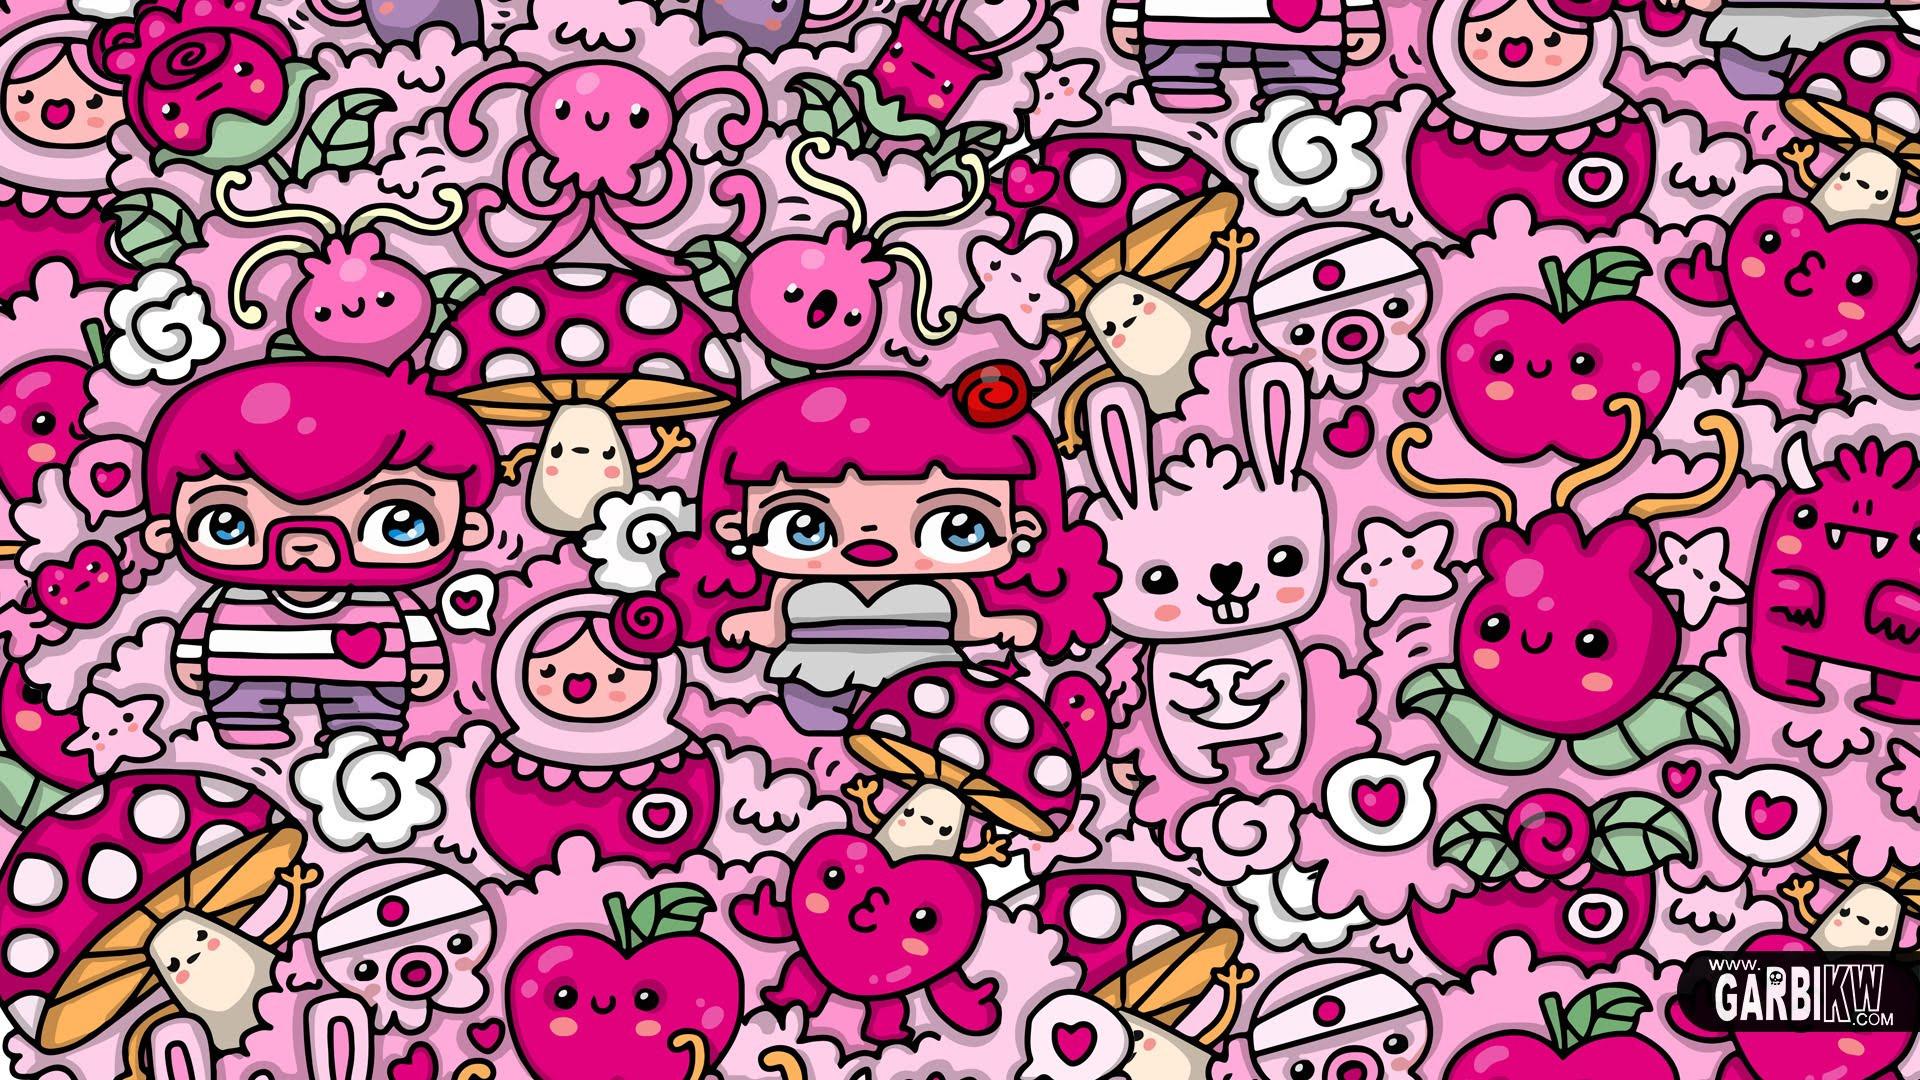 Doodle Wallpaper 40 Images